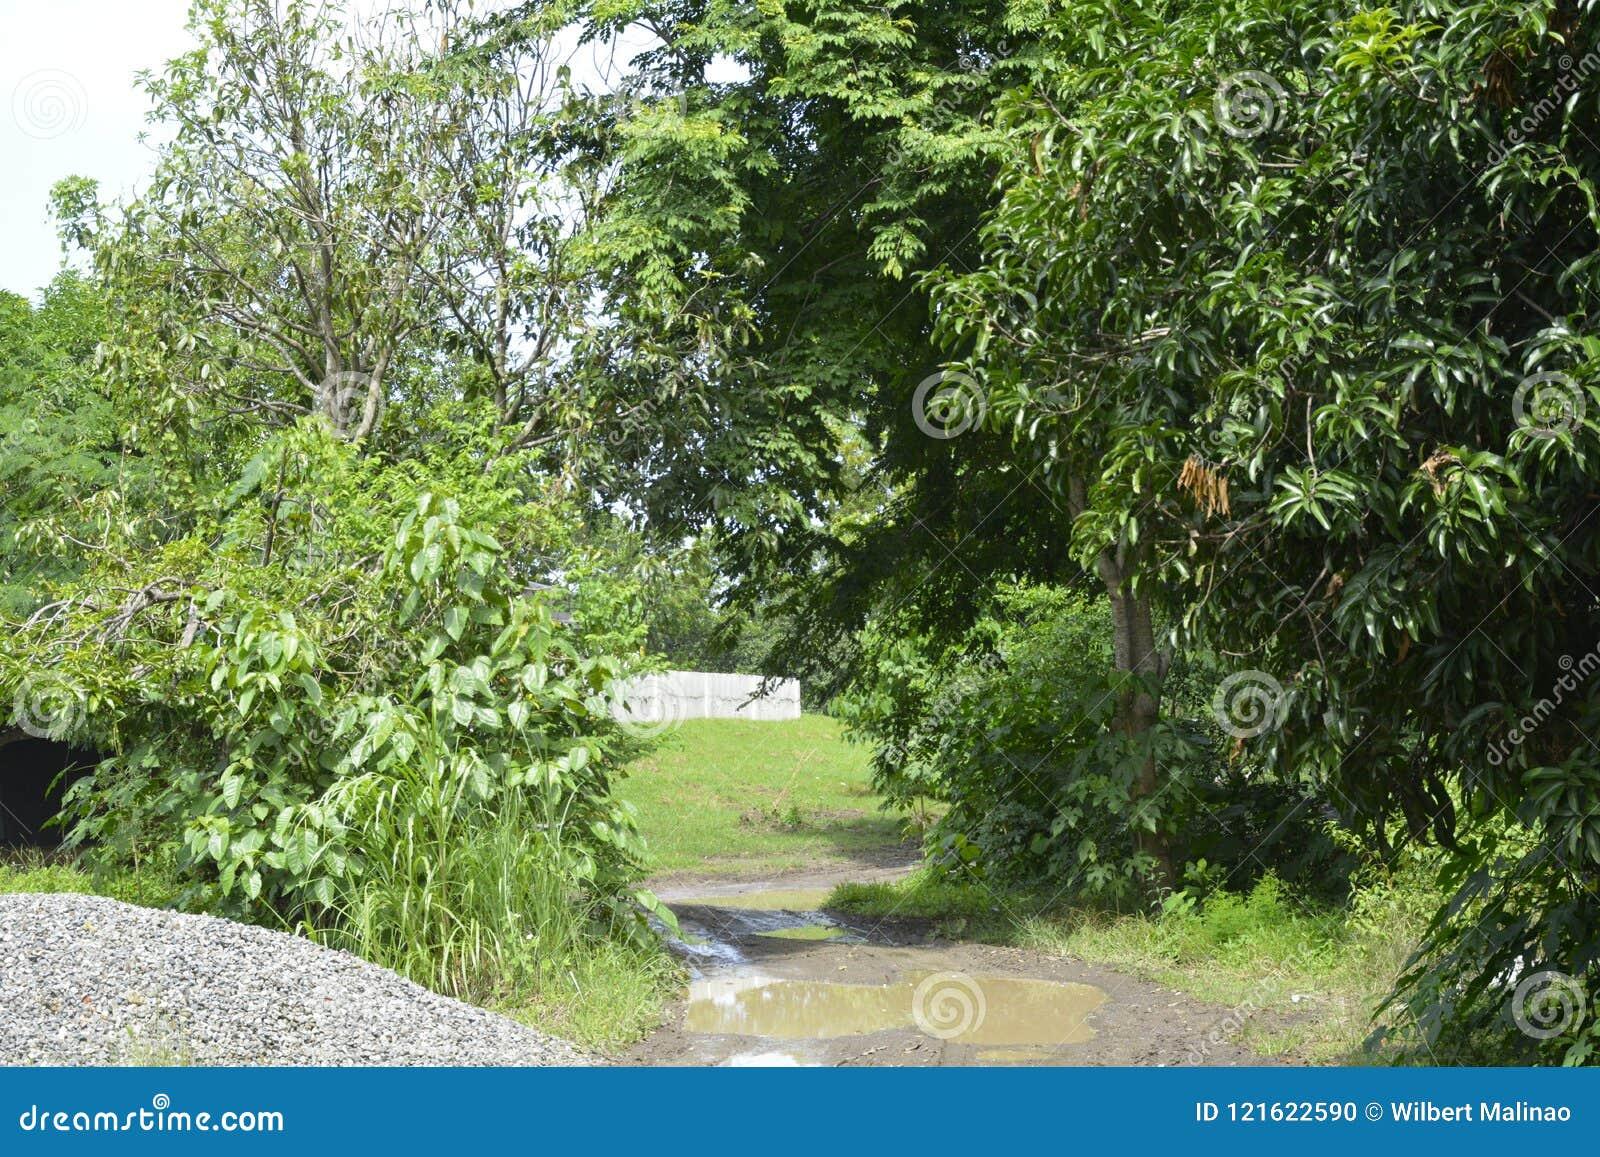 Dozownik droga wiodący outside PENRO-LGU